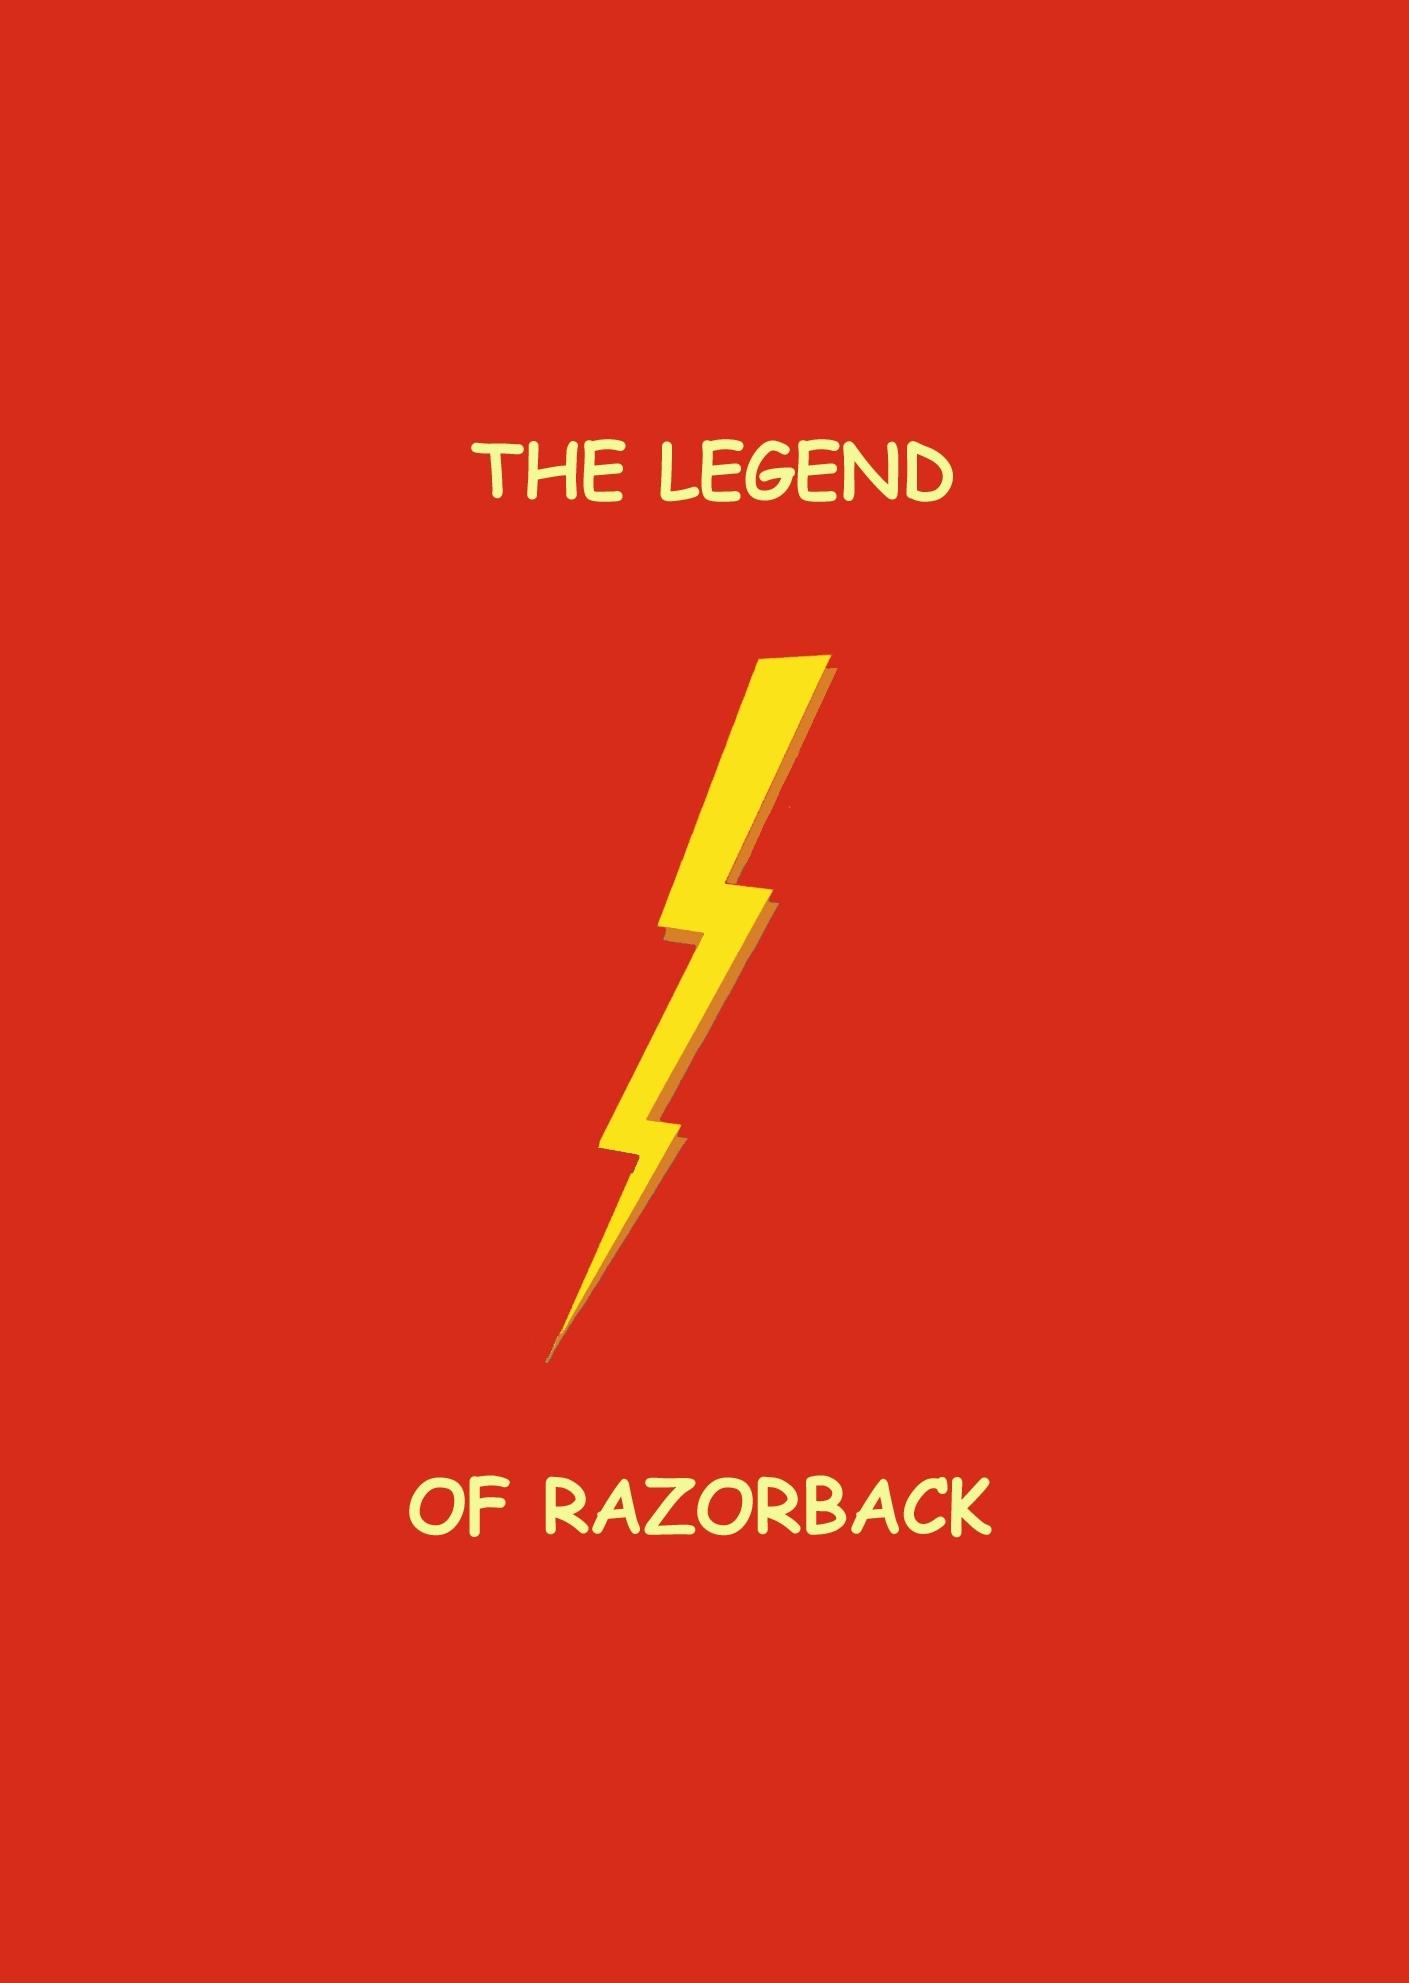 Razorback Poster Art.jpg